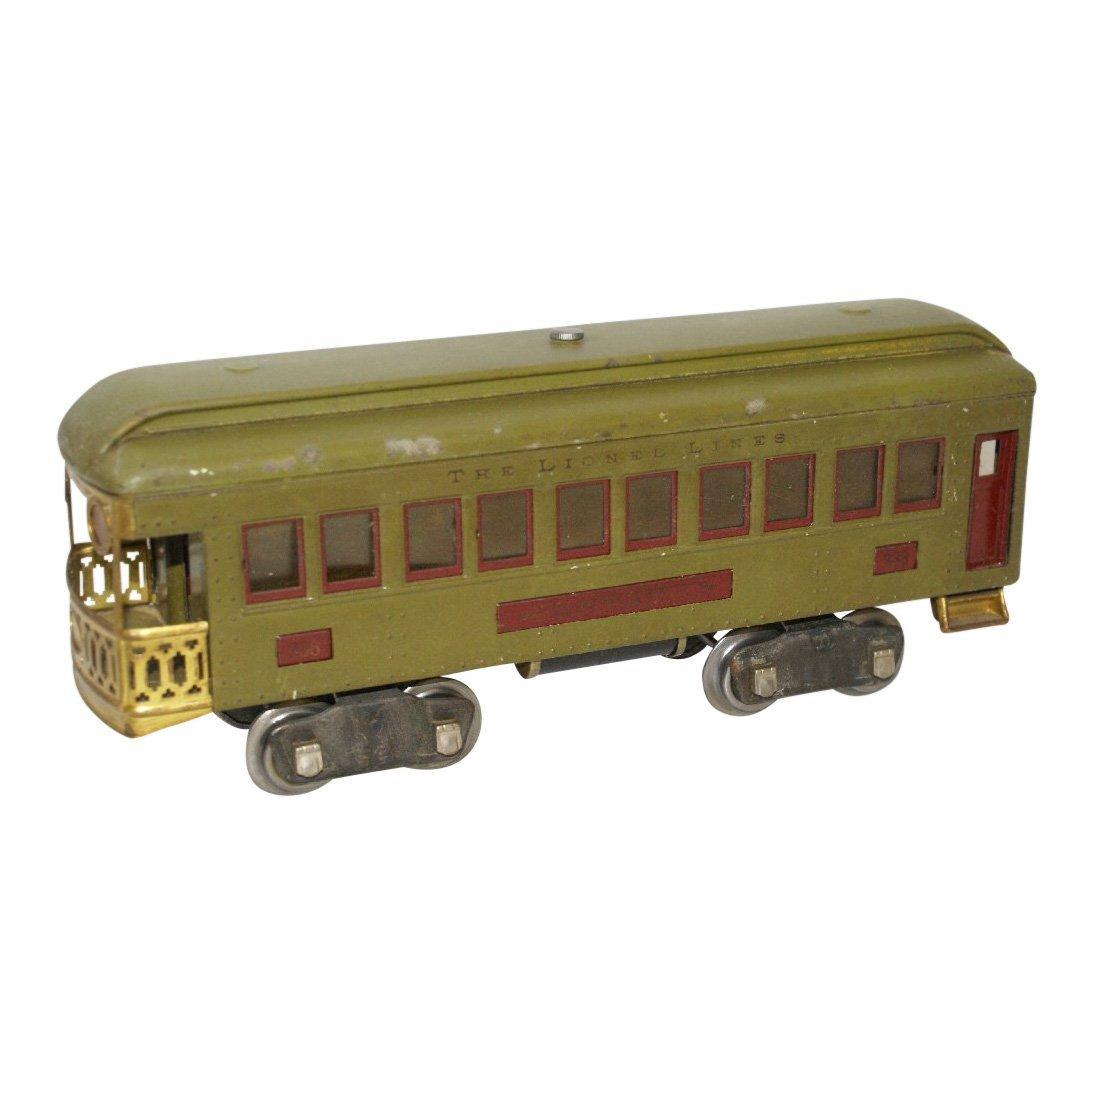 Pre-War Standard Gauge Lionel Lighted Green Train Car